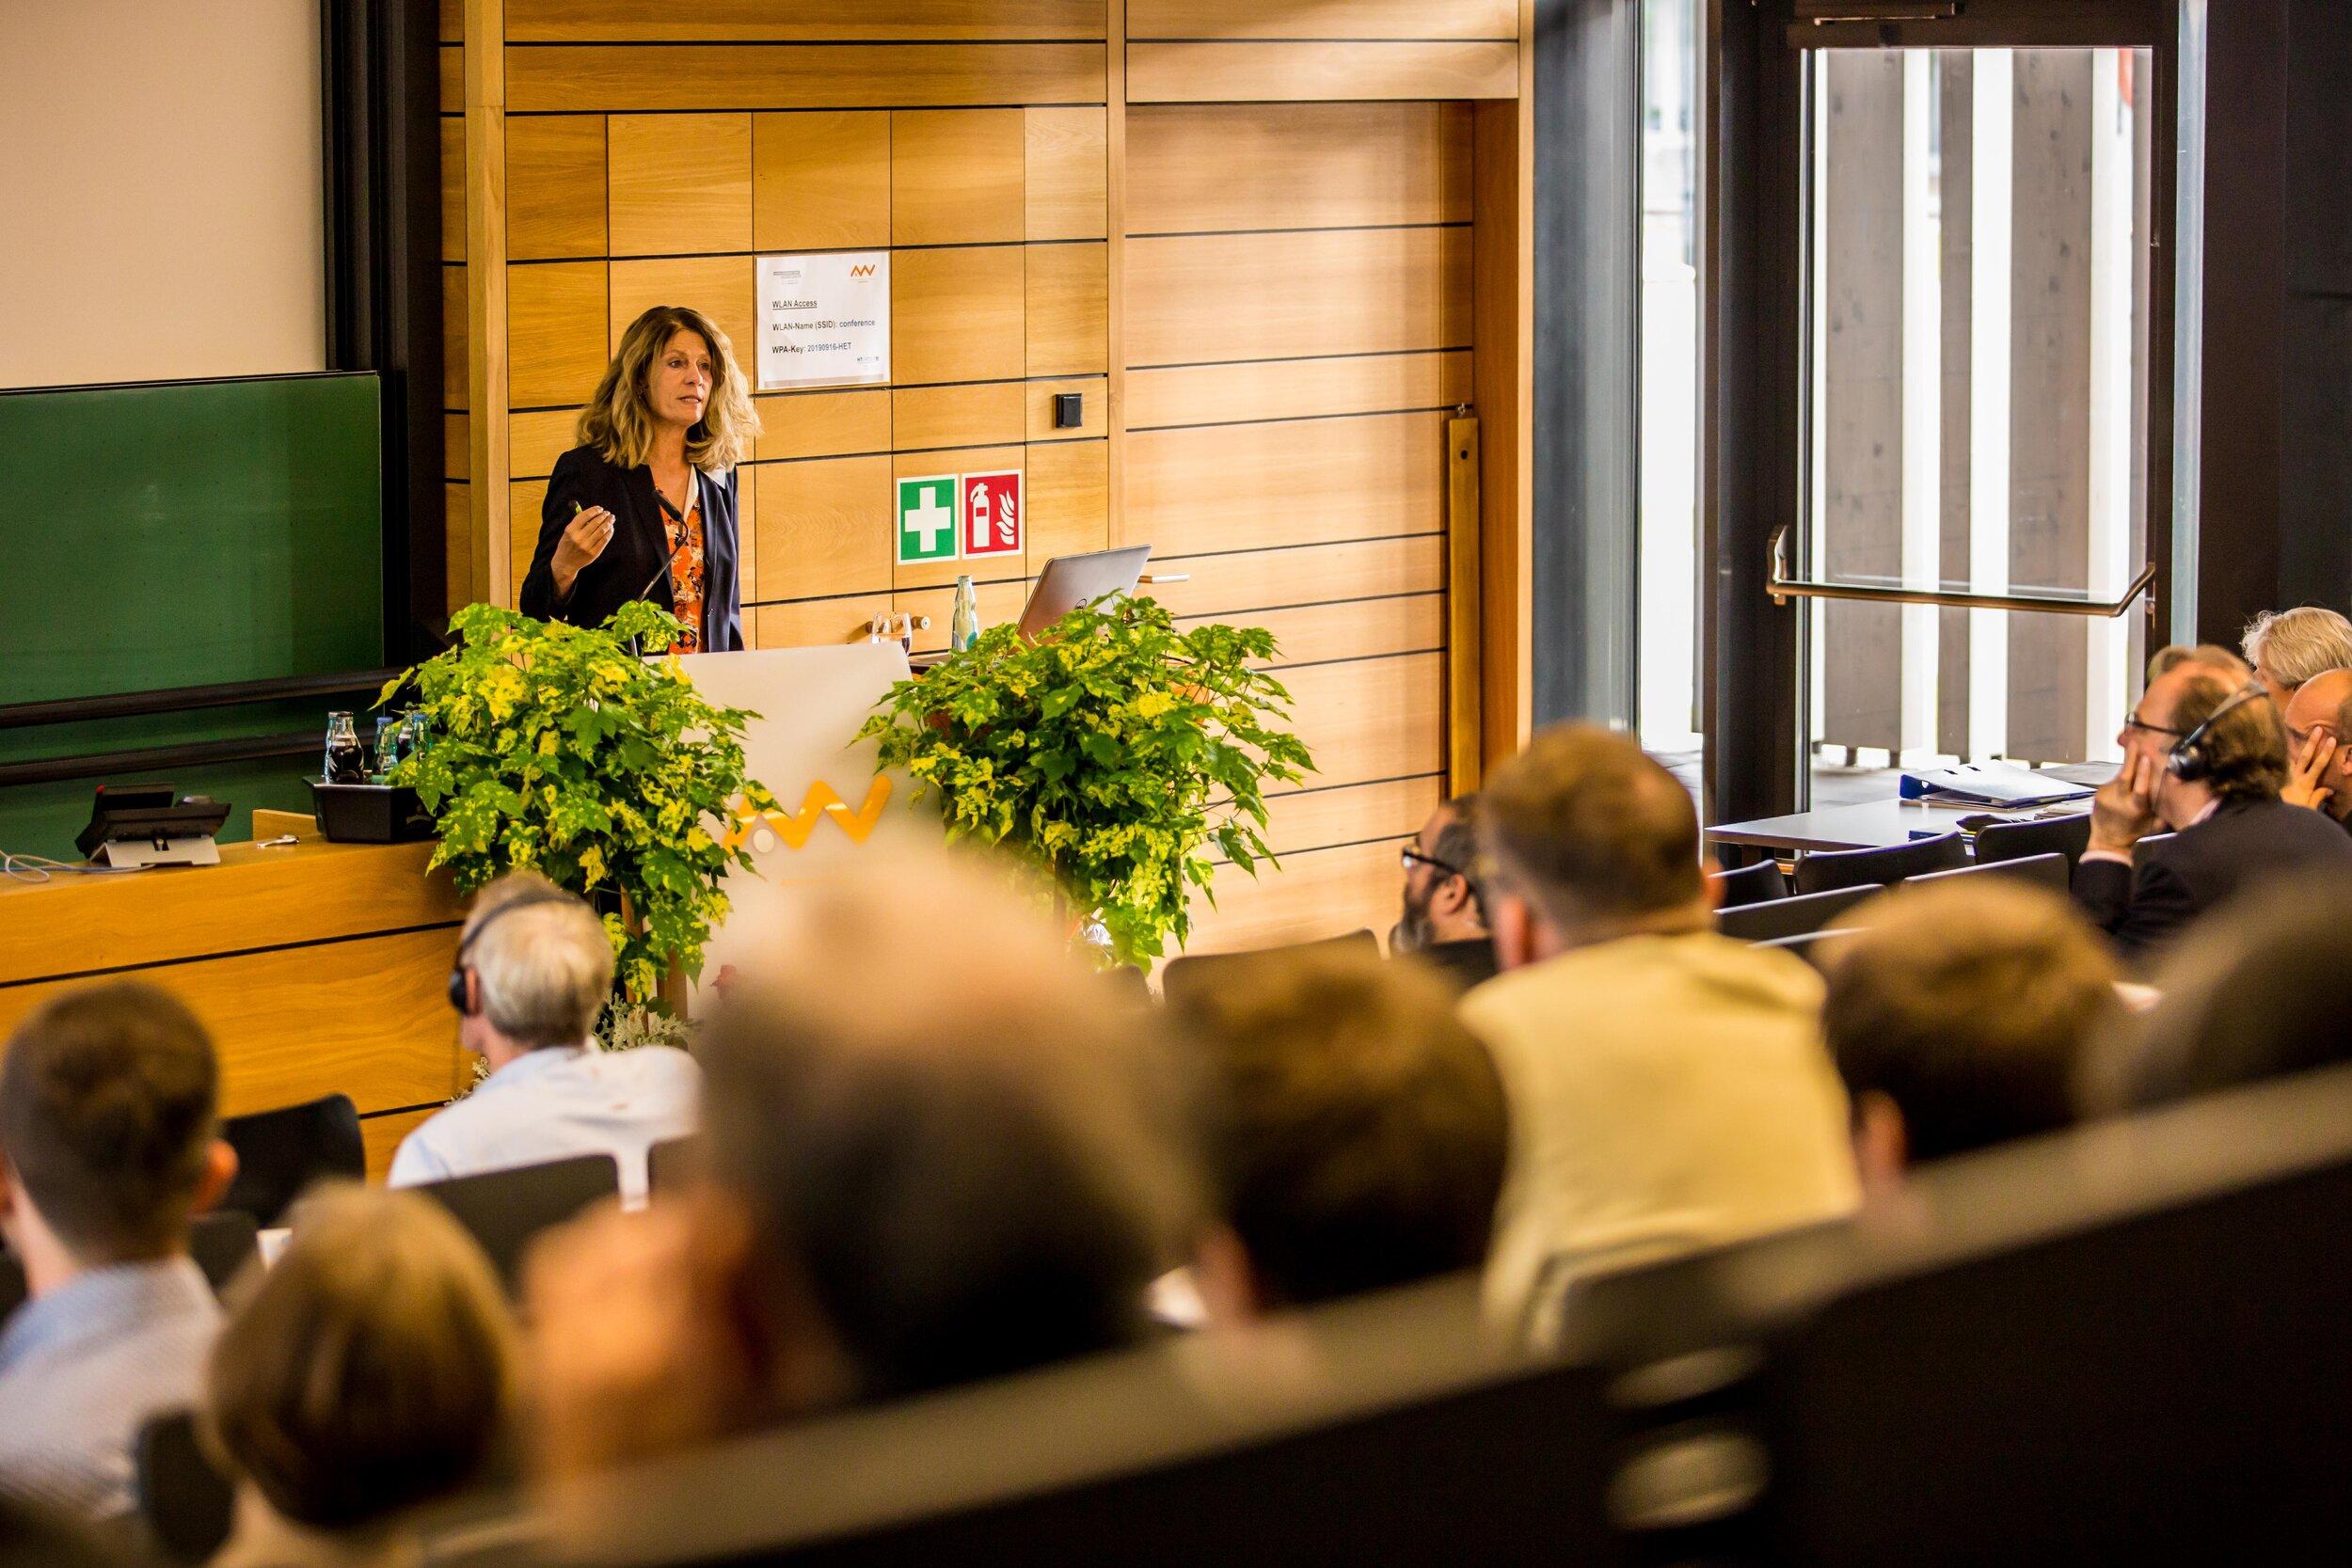 "Dr. Birgit Dietz during her presentation at the Technische Hochschule Amberg-Weiden on""Age- and dementia-sensitive architecture for healthcare facilities"".  Foto:Robert Neubauer_OTH Amberg-Weiden"